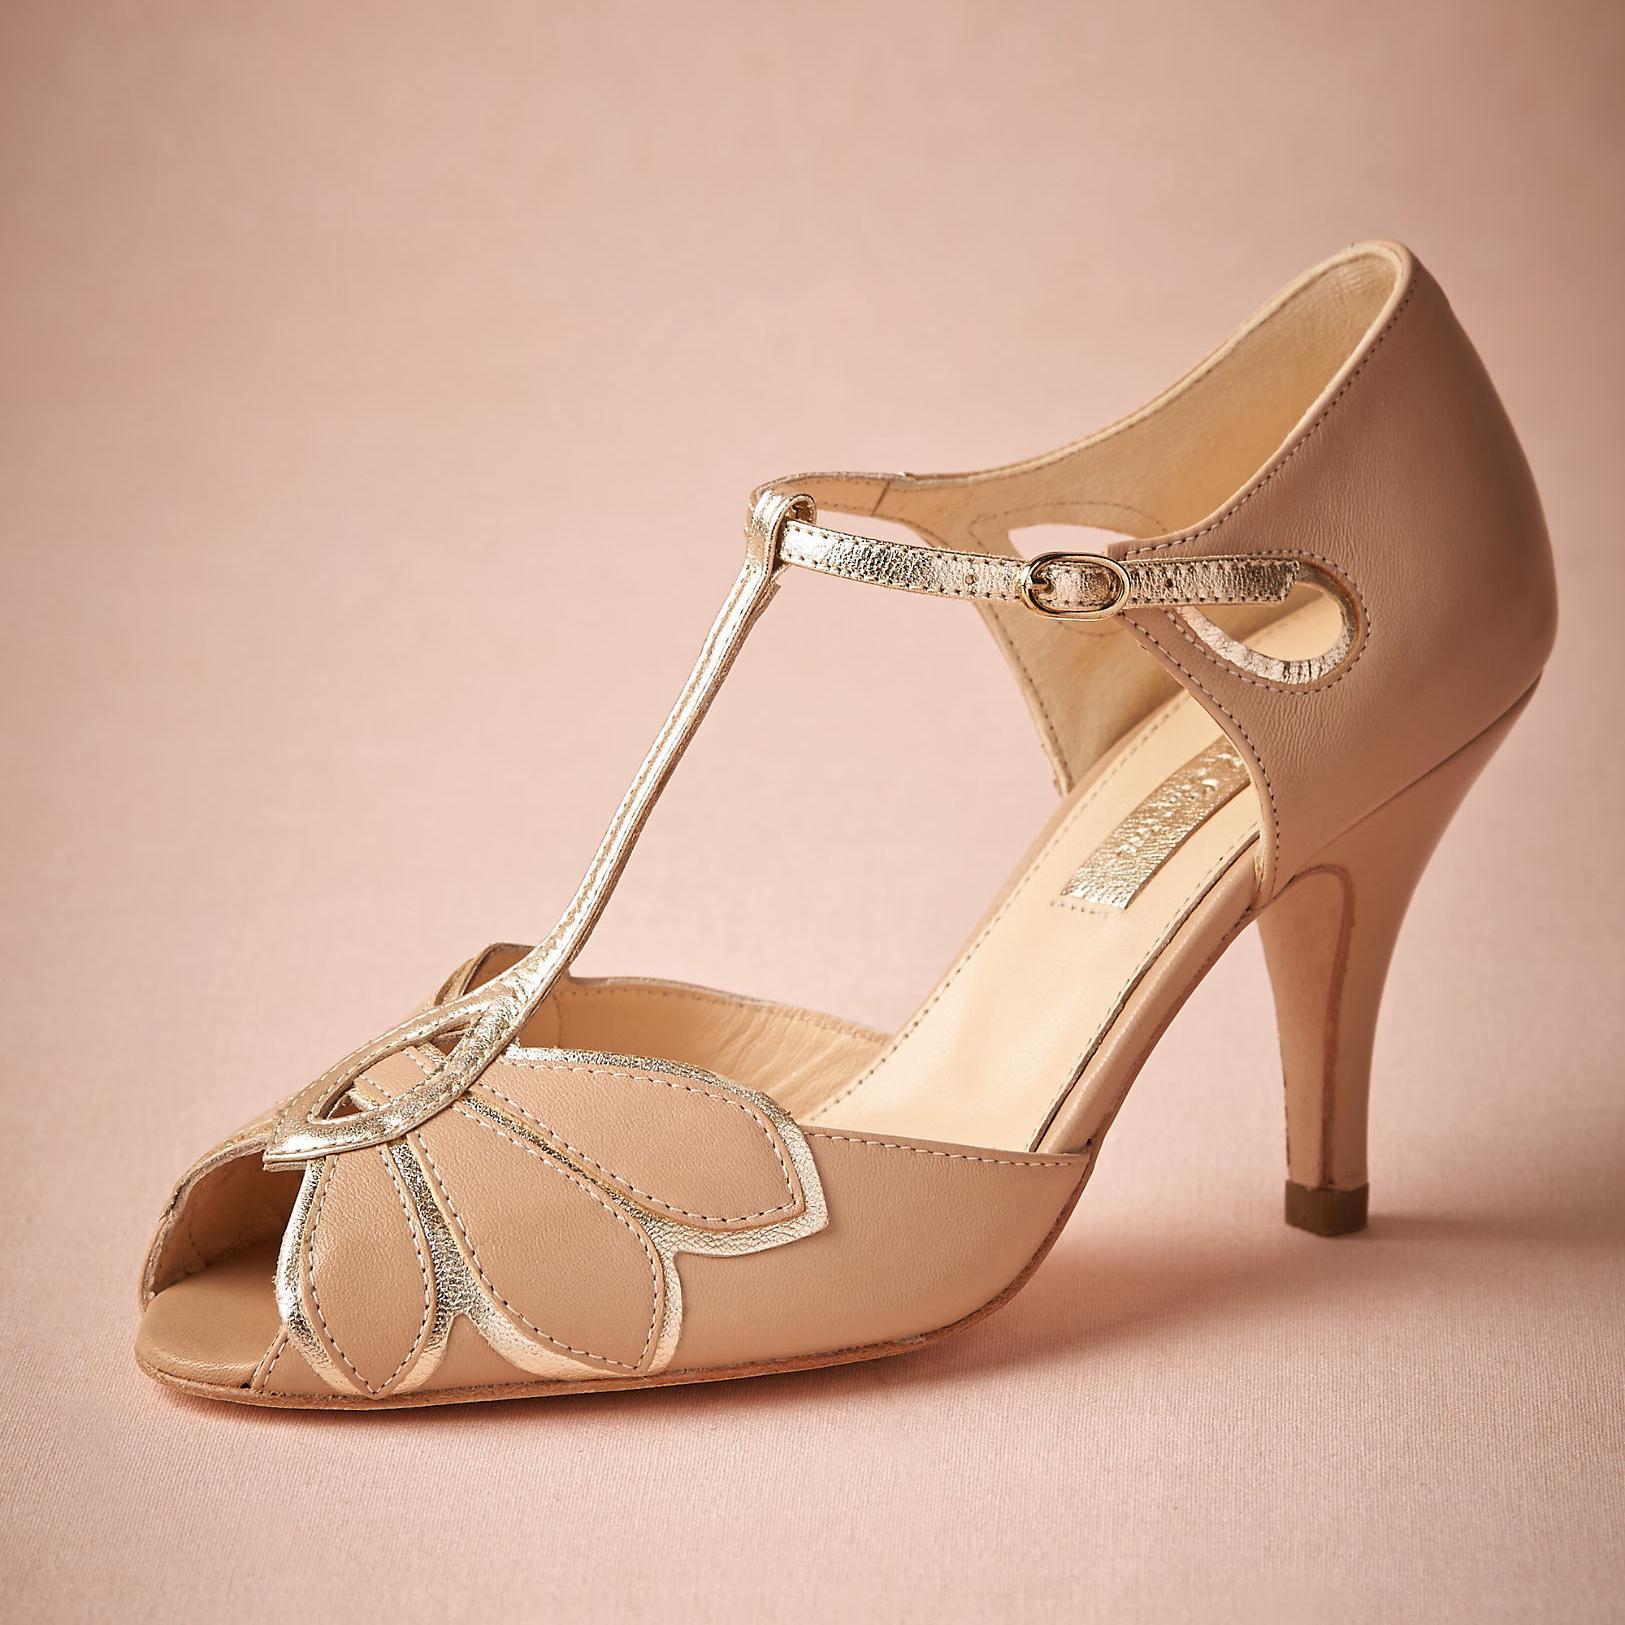 2016 Real Vintage Blush Wedding Shoes For Women Pumps T Straps